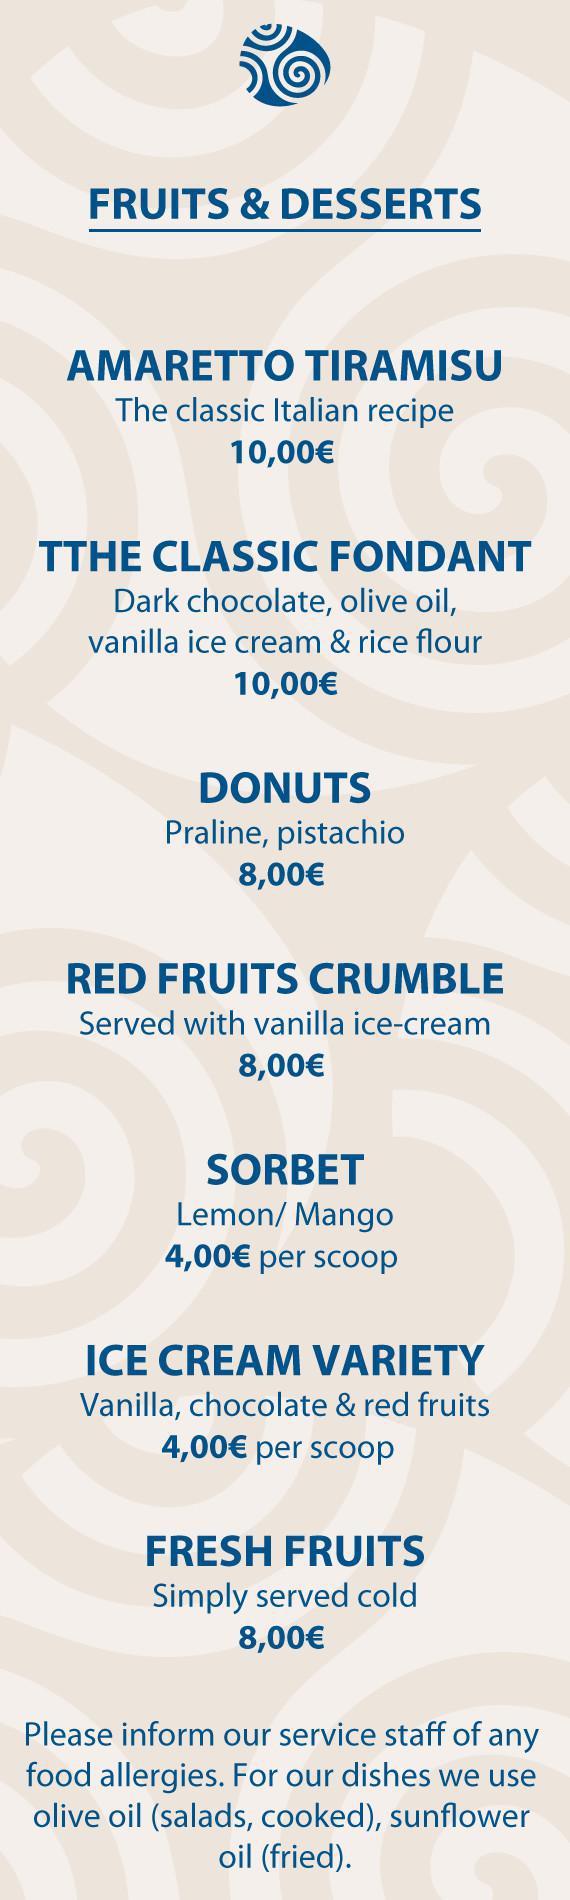 Fruits & Desserts